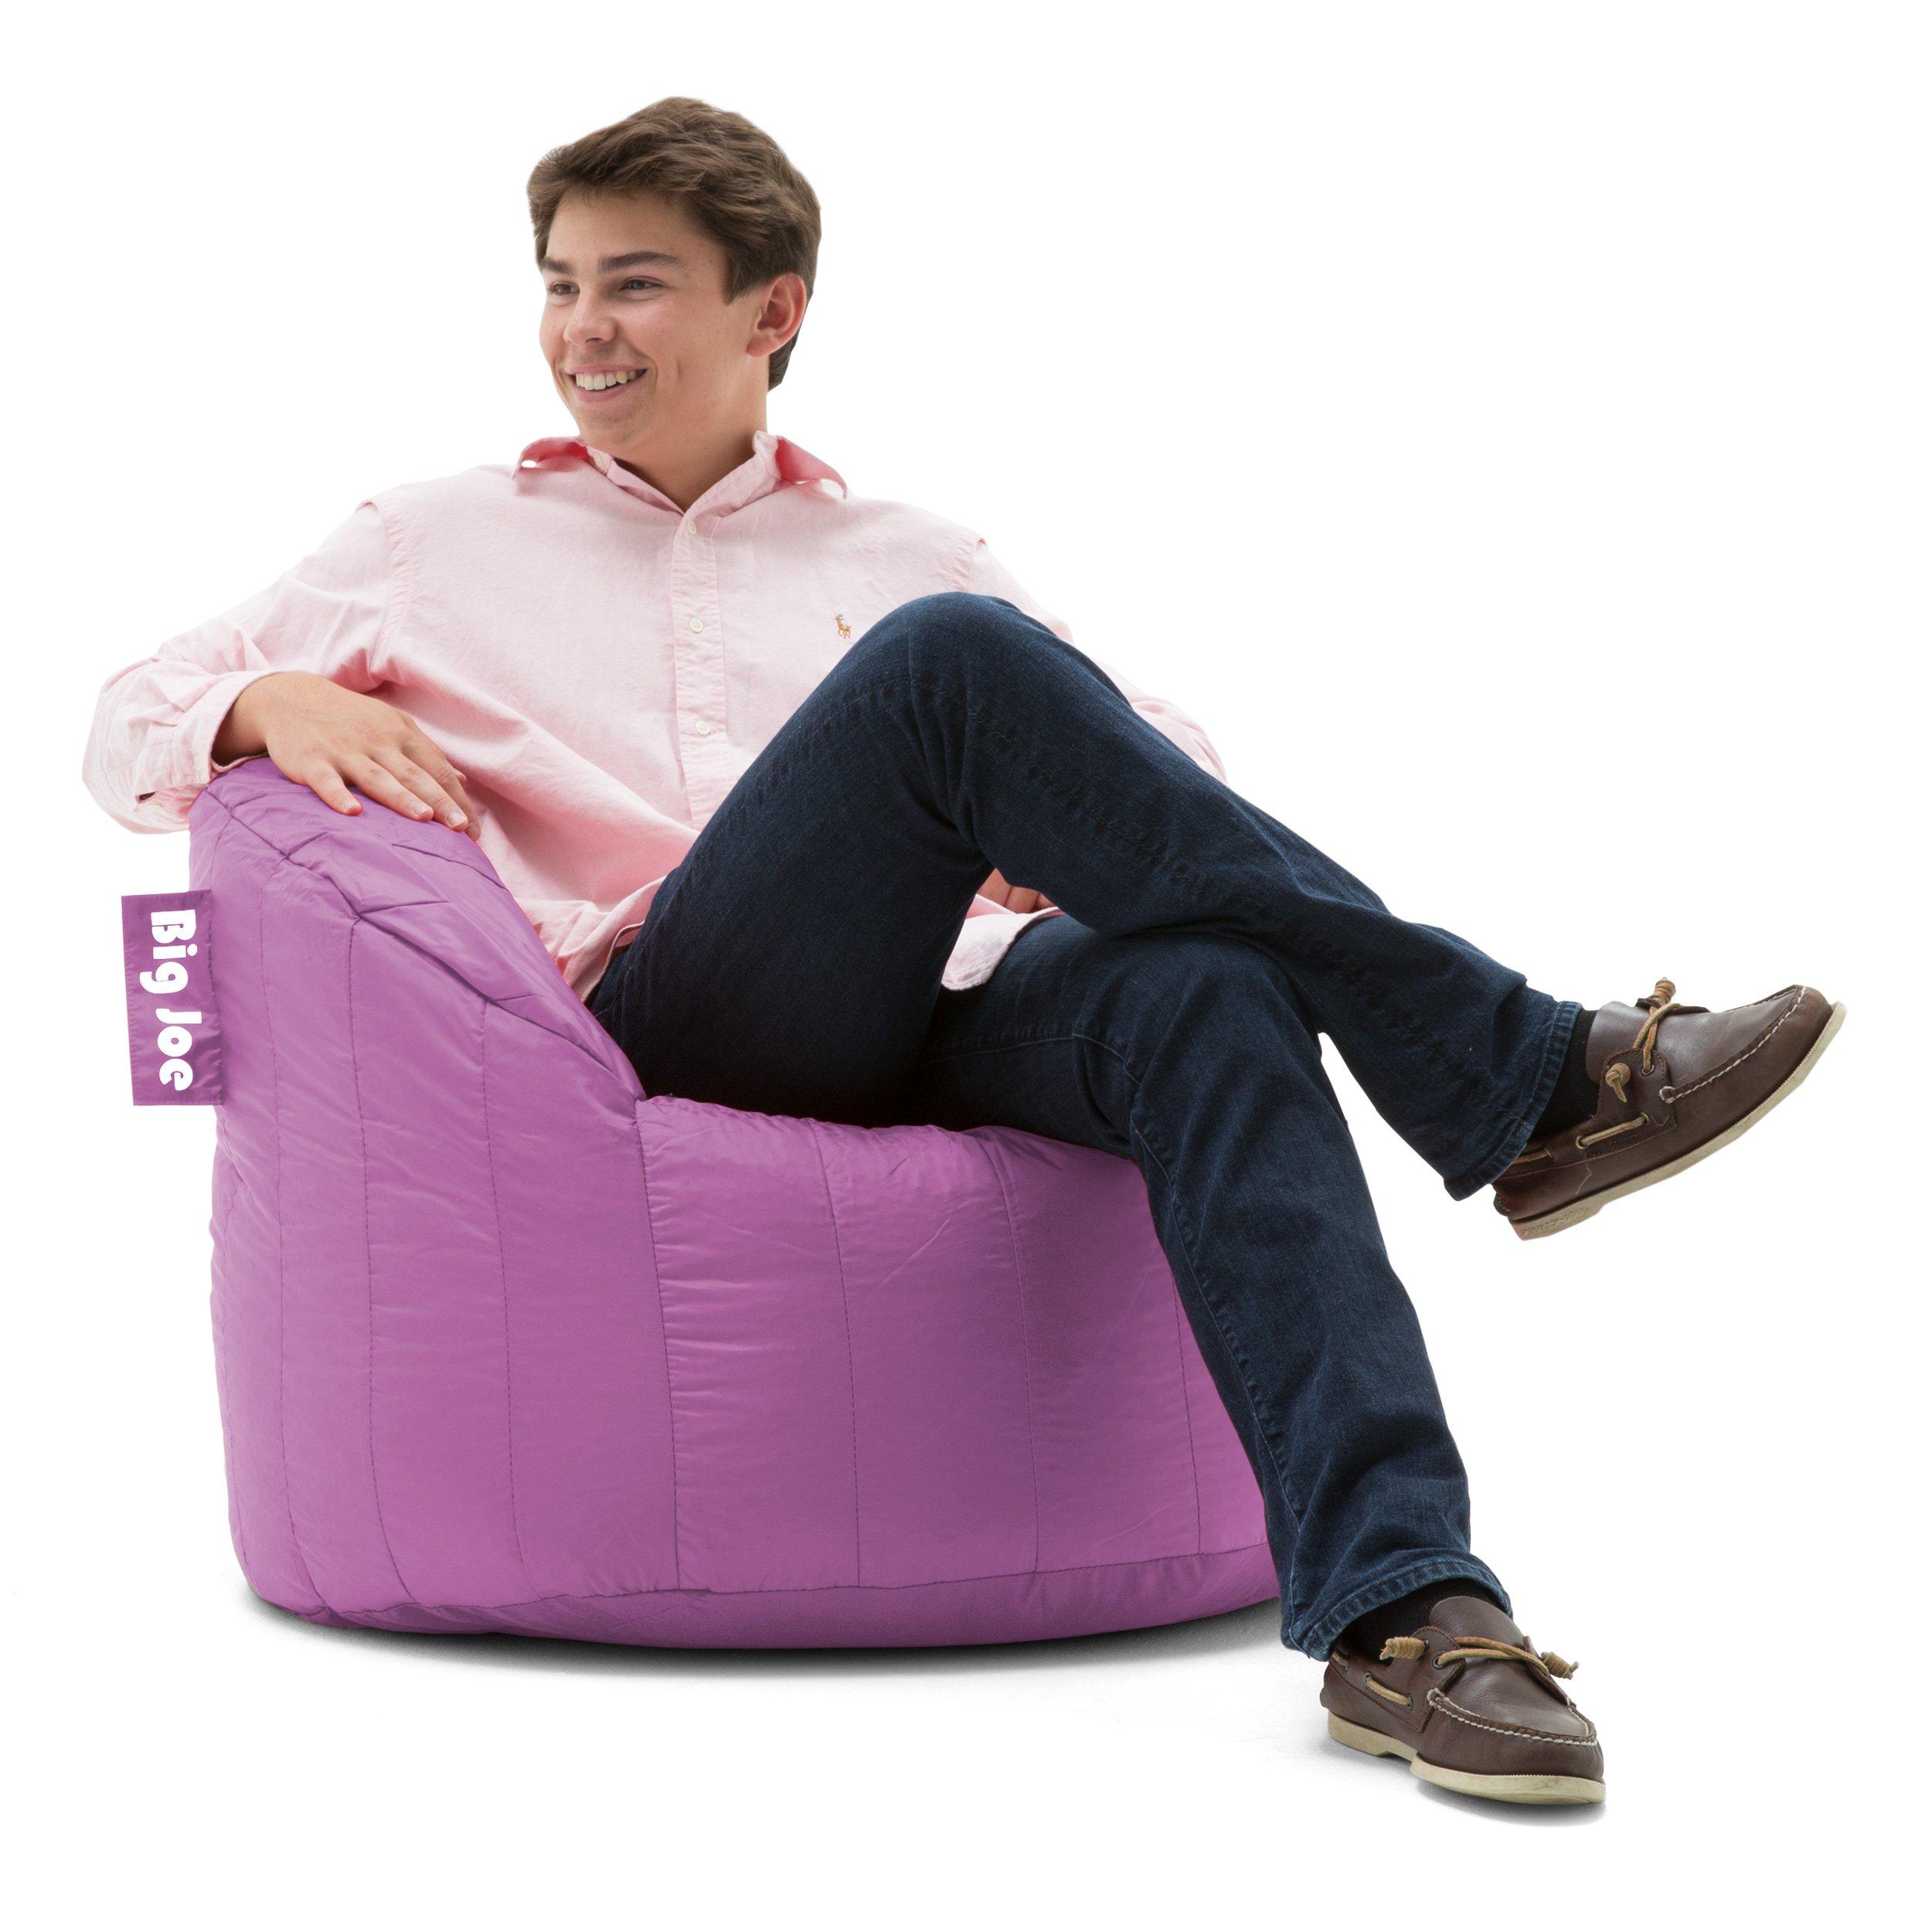 Big Joe Lumin SmartMax Fabric Chair, Fuchsia by Big Joe